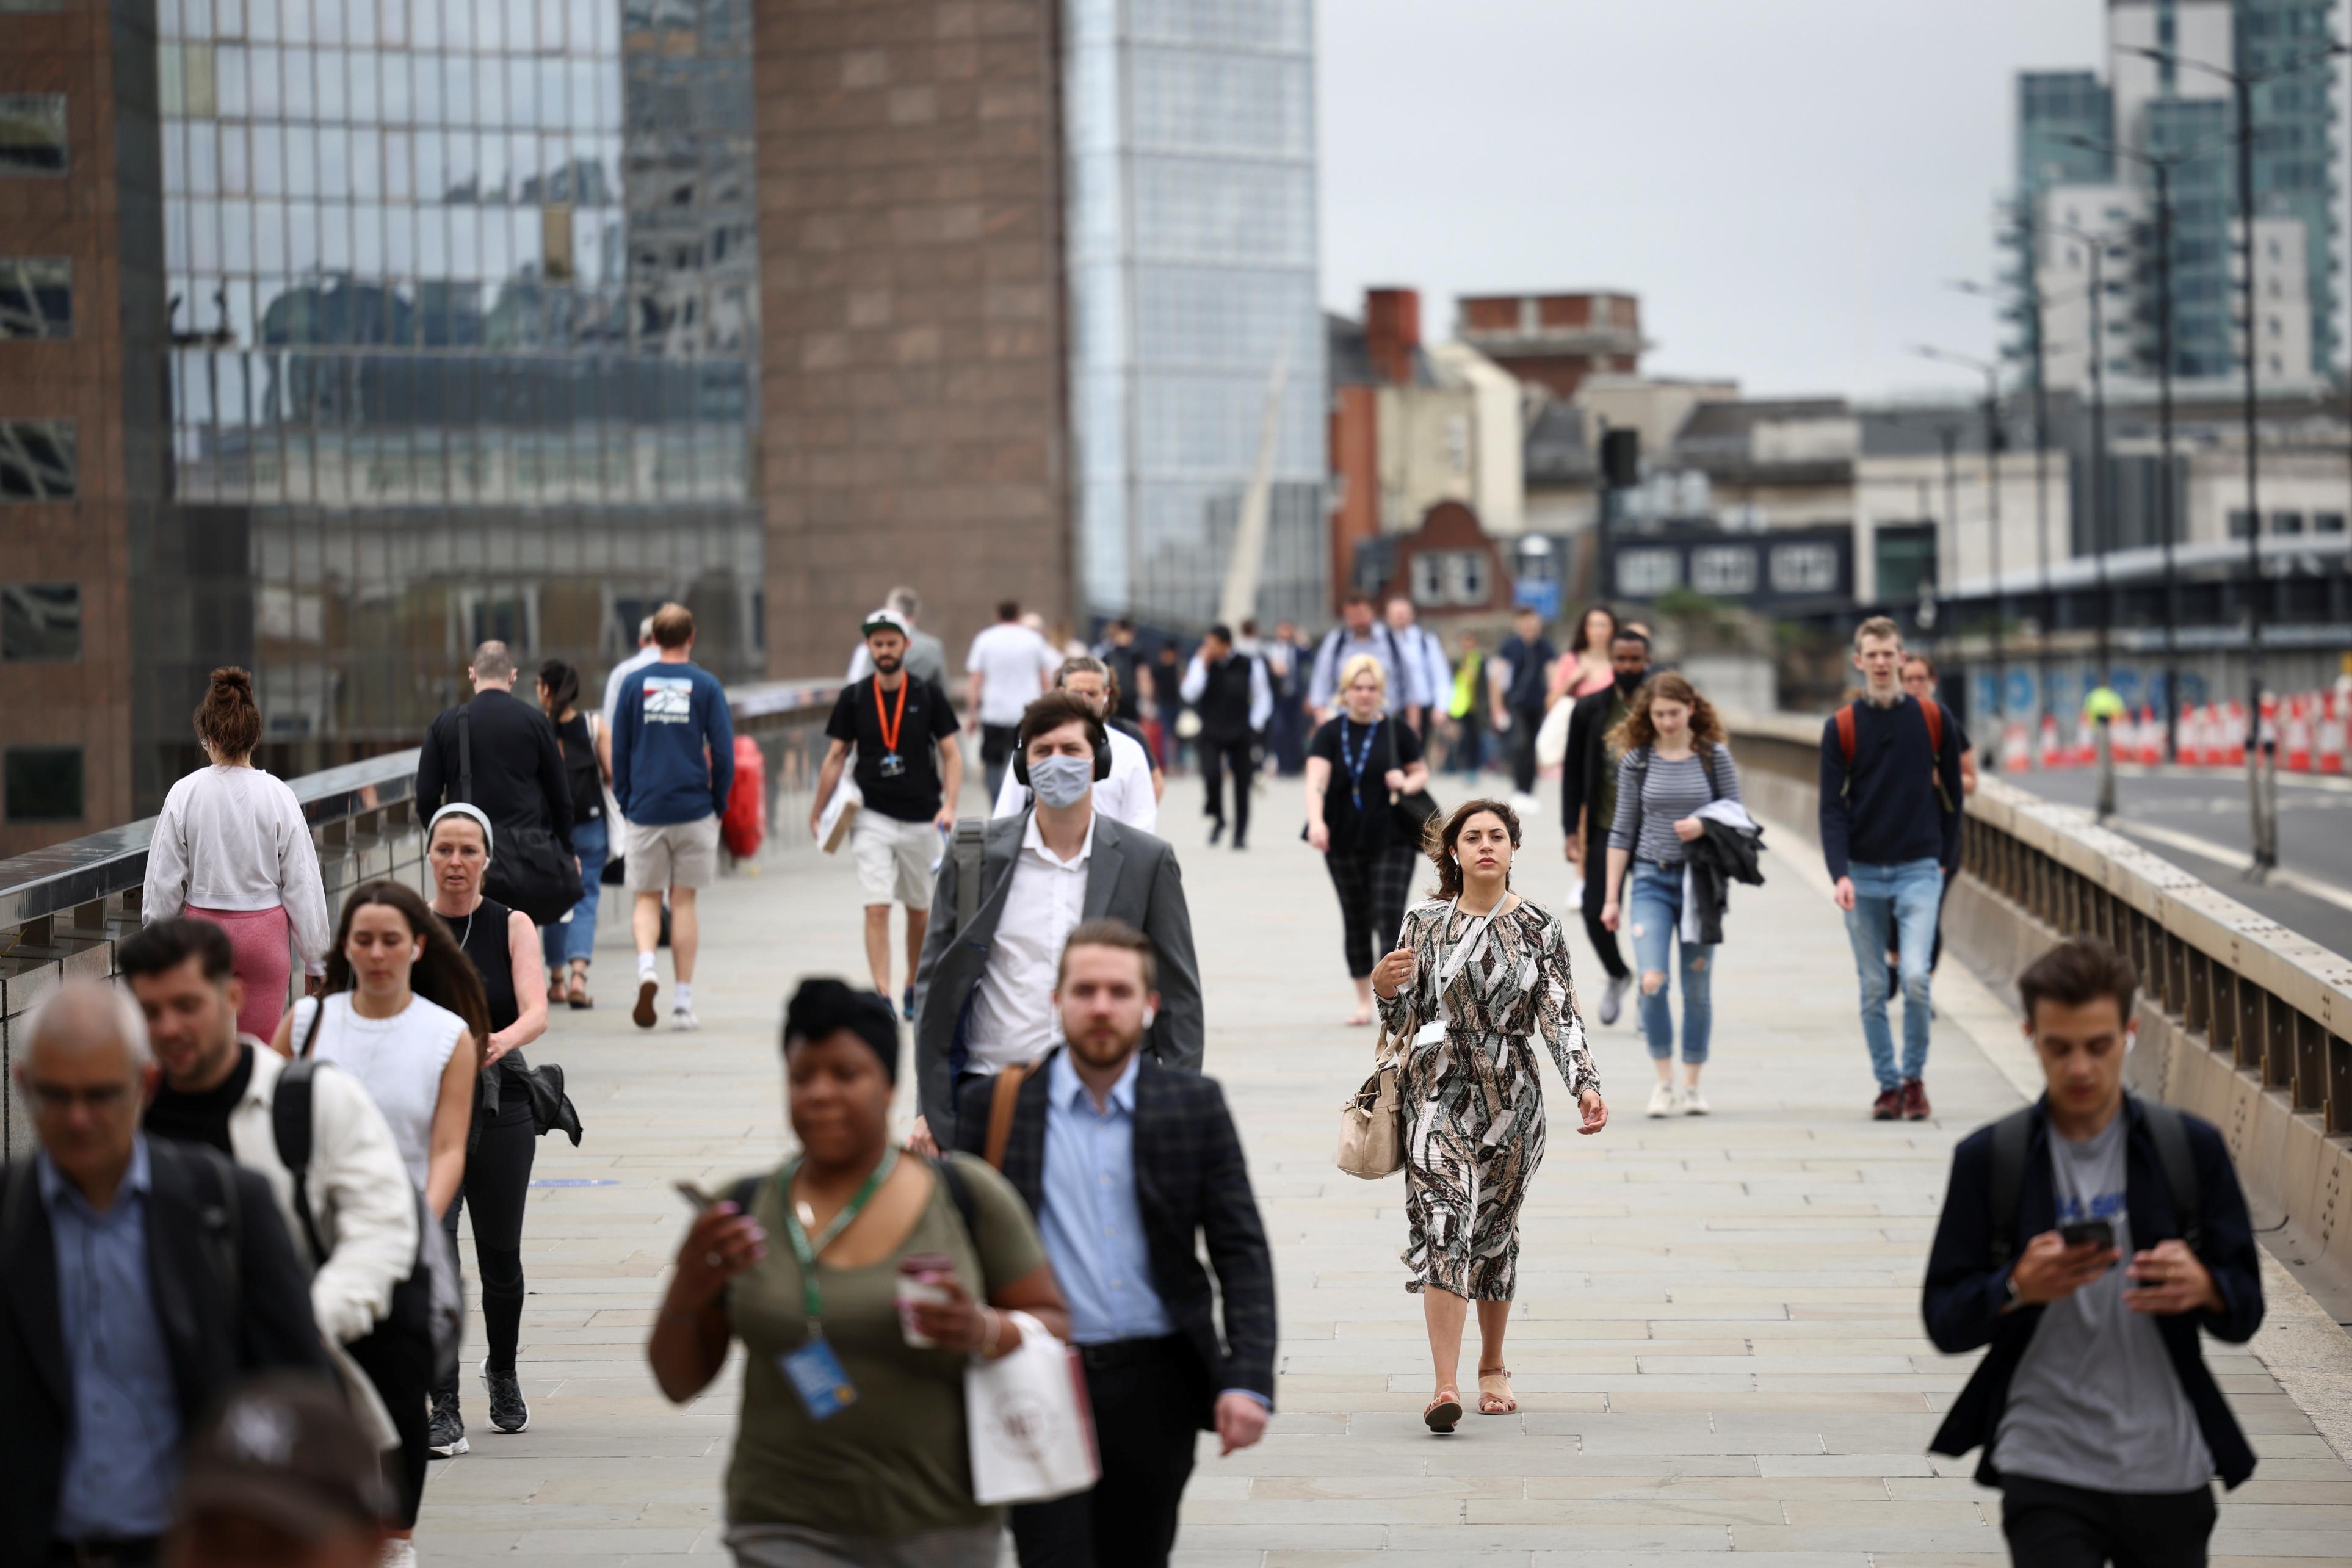 People walk across London Bridge during morning rush hour, in London, Britain, June 11, 2021. REUTERS/Henry Nicholls